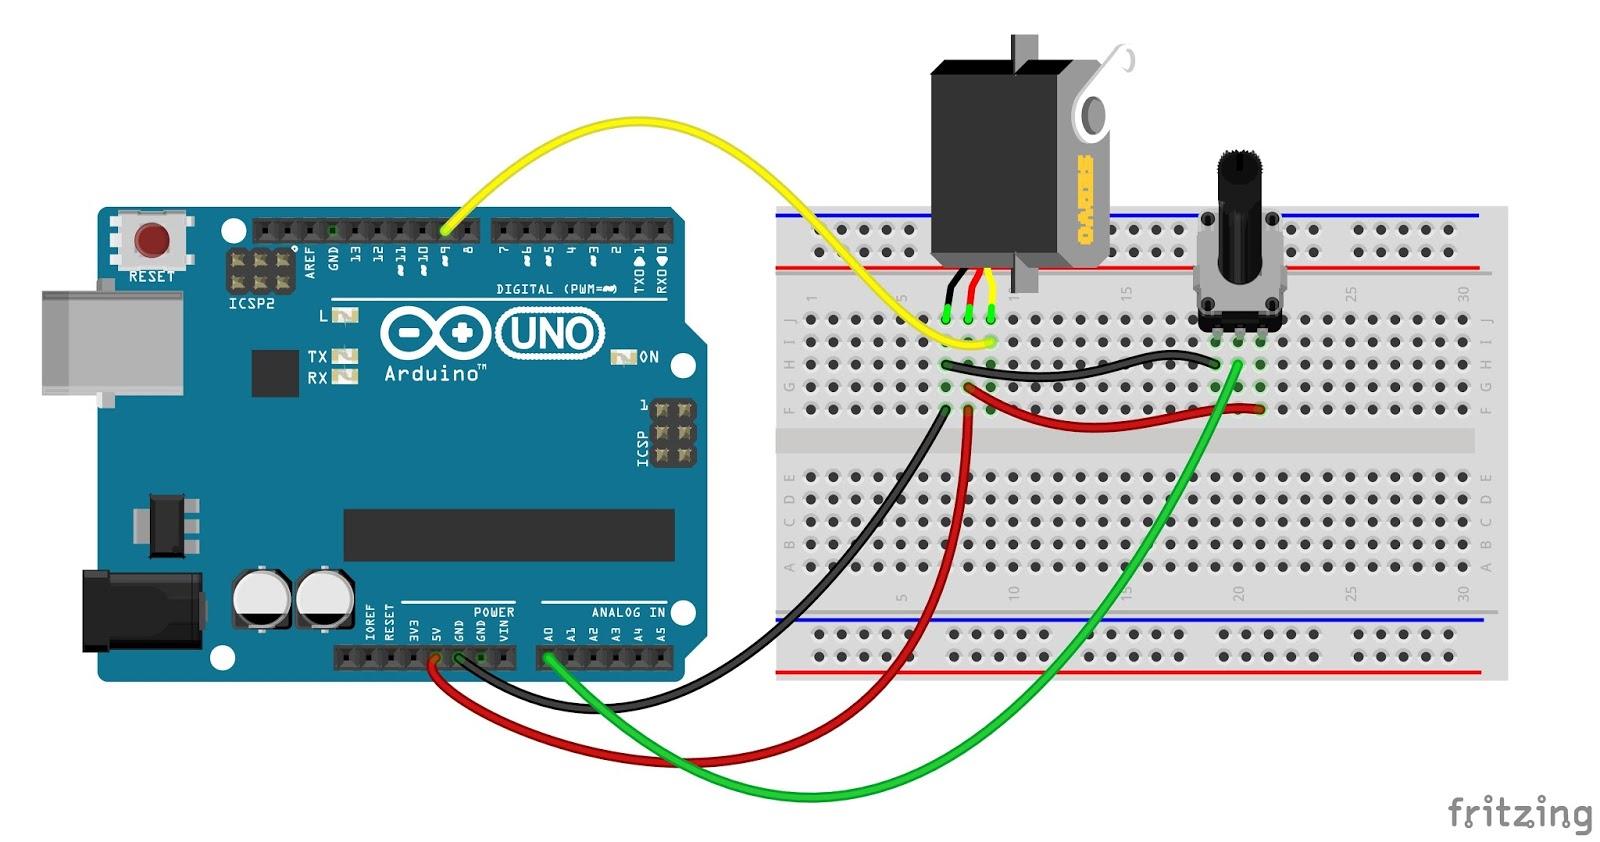 arduino stepper motor driver circuit diagram with arduino mach3 cnc board wiring diagram cnc machine diagram [ 1600 x 842 Pixel ]